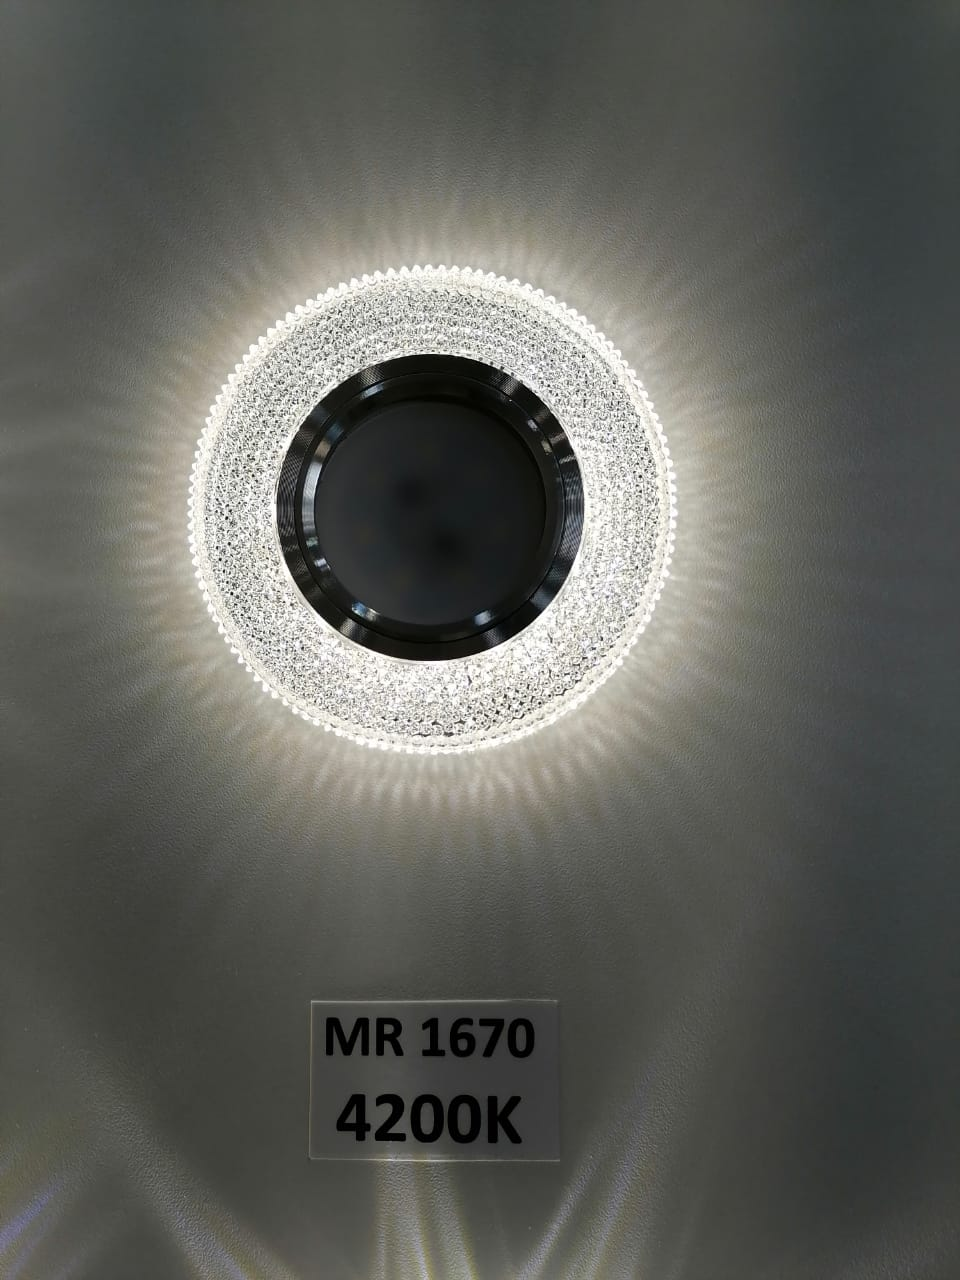 MR 1670